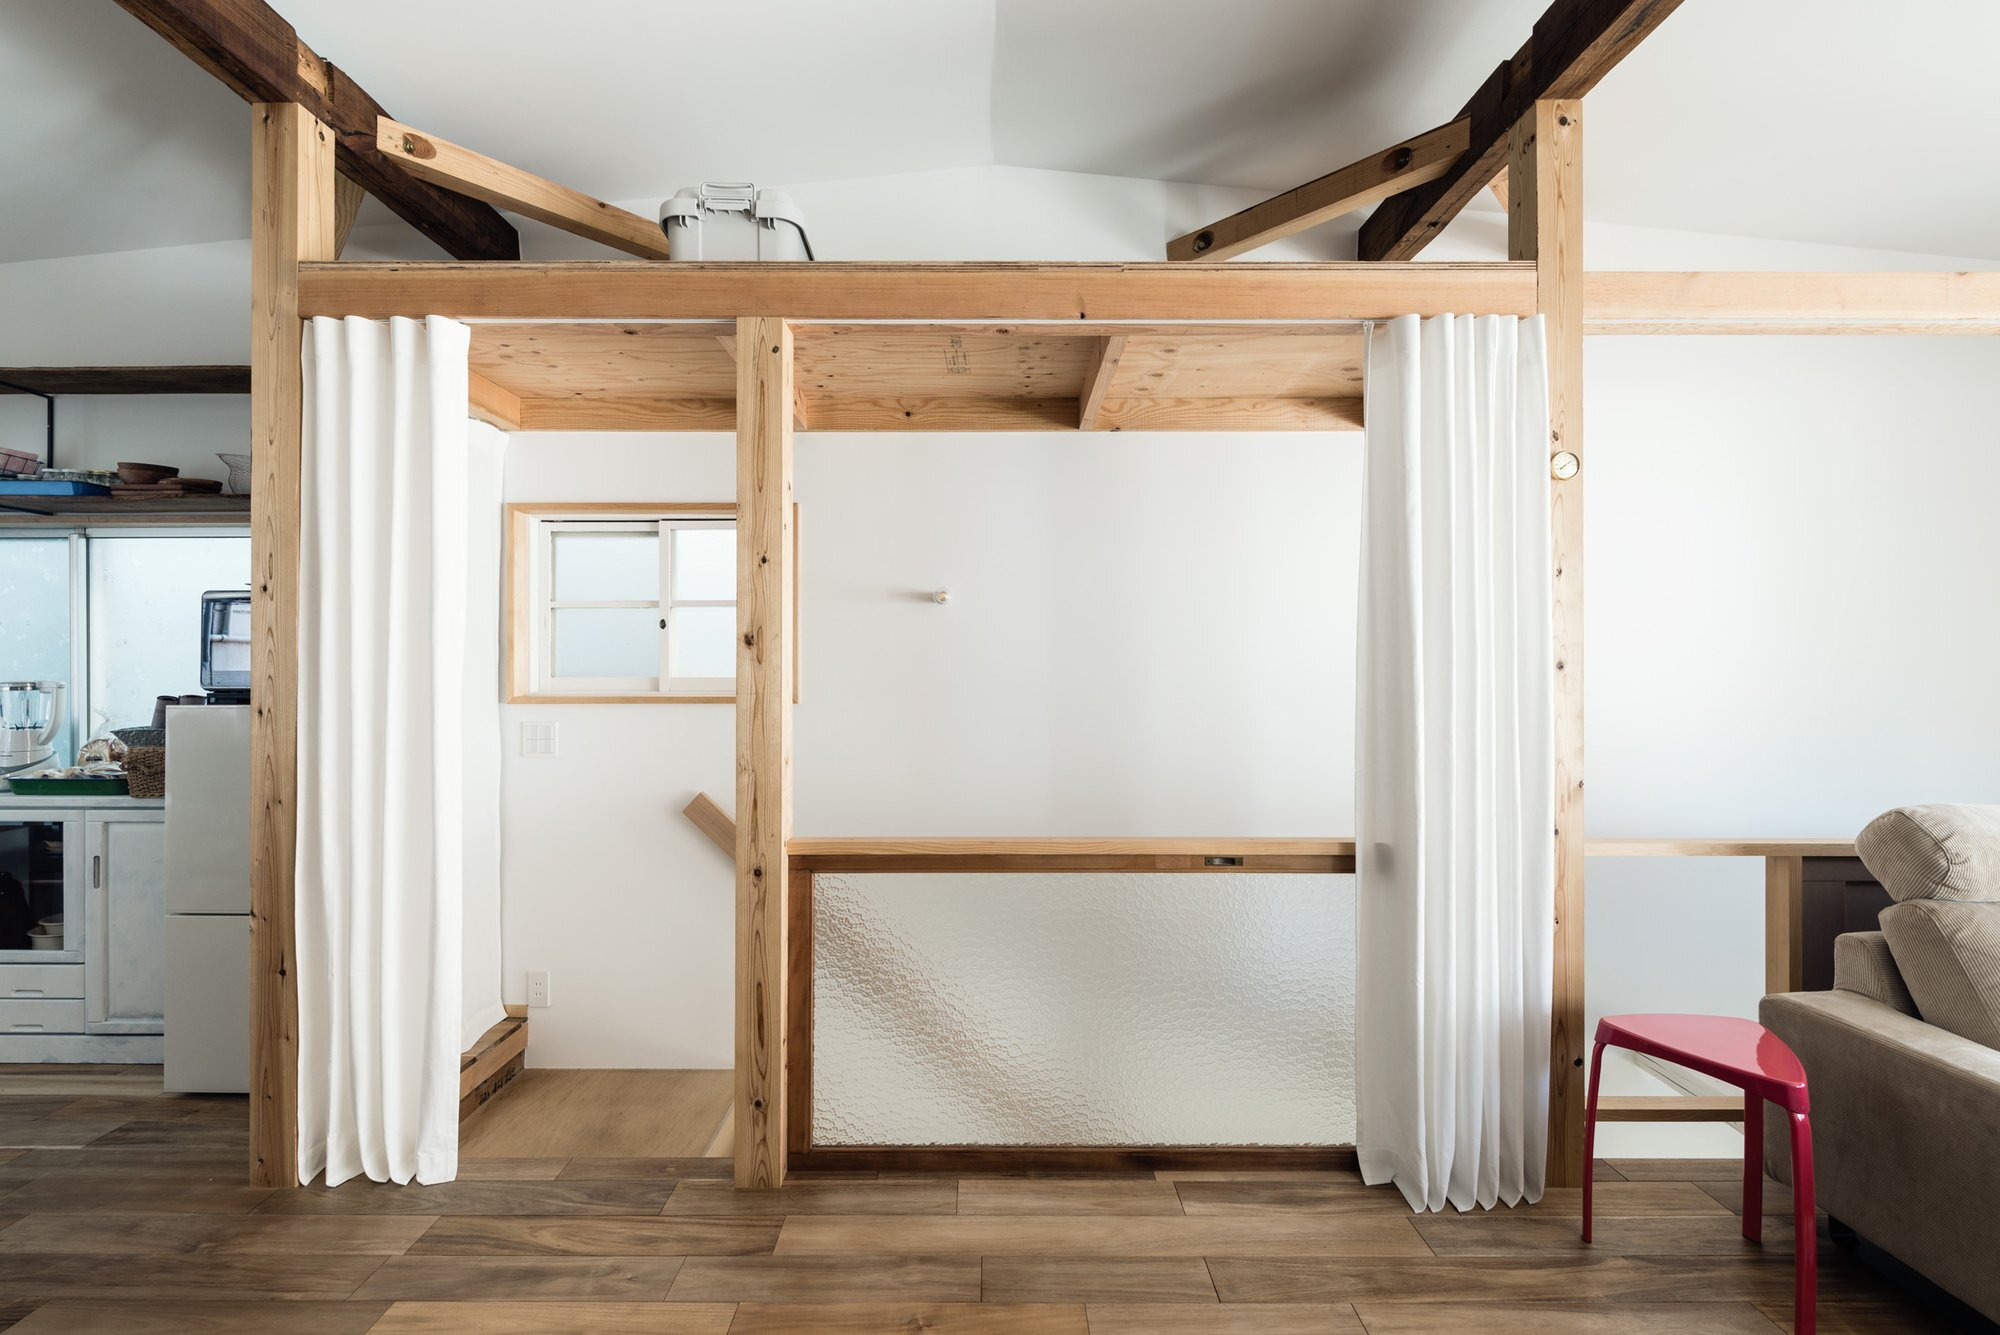 Re-Toyosaki - Small Japanese House - Coil Kazuteru Matumura Architects - Osaka Japan - Hallway - Humble Homes